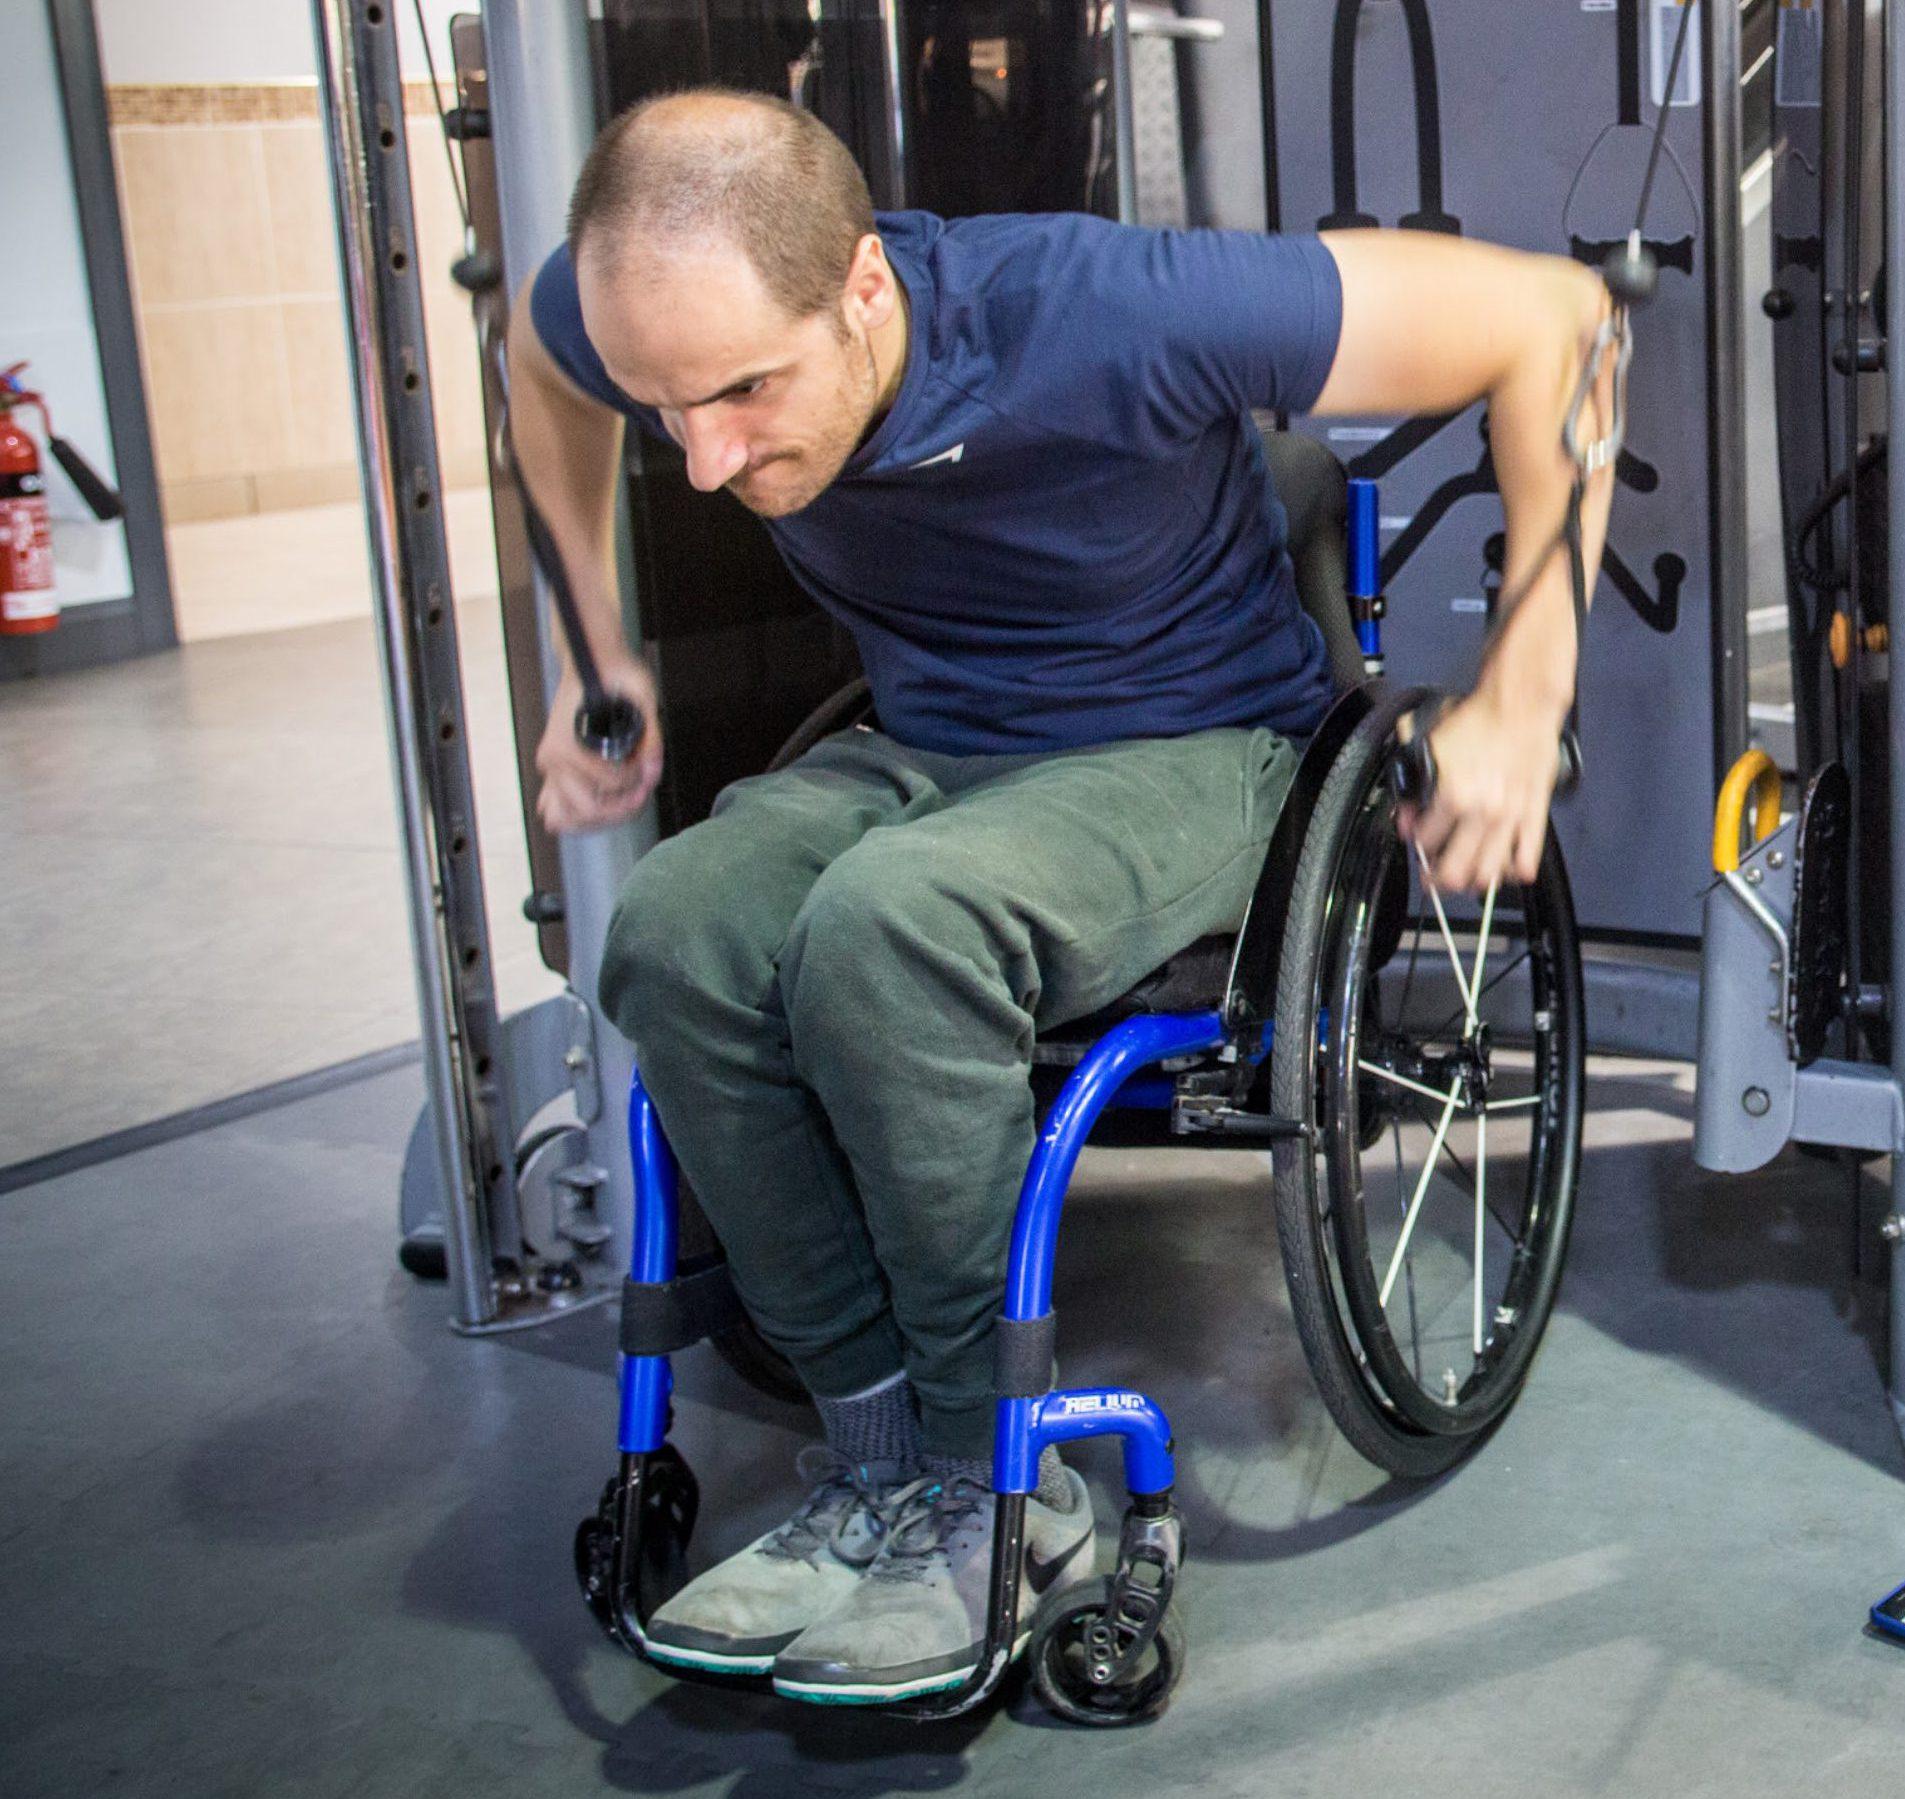 Ben Clark practicing strength training at the gym in preparation for his 10km tetraplegic swim